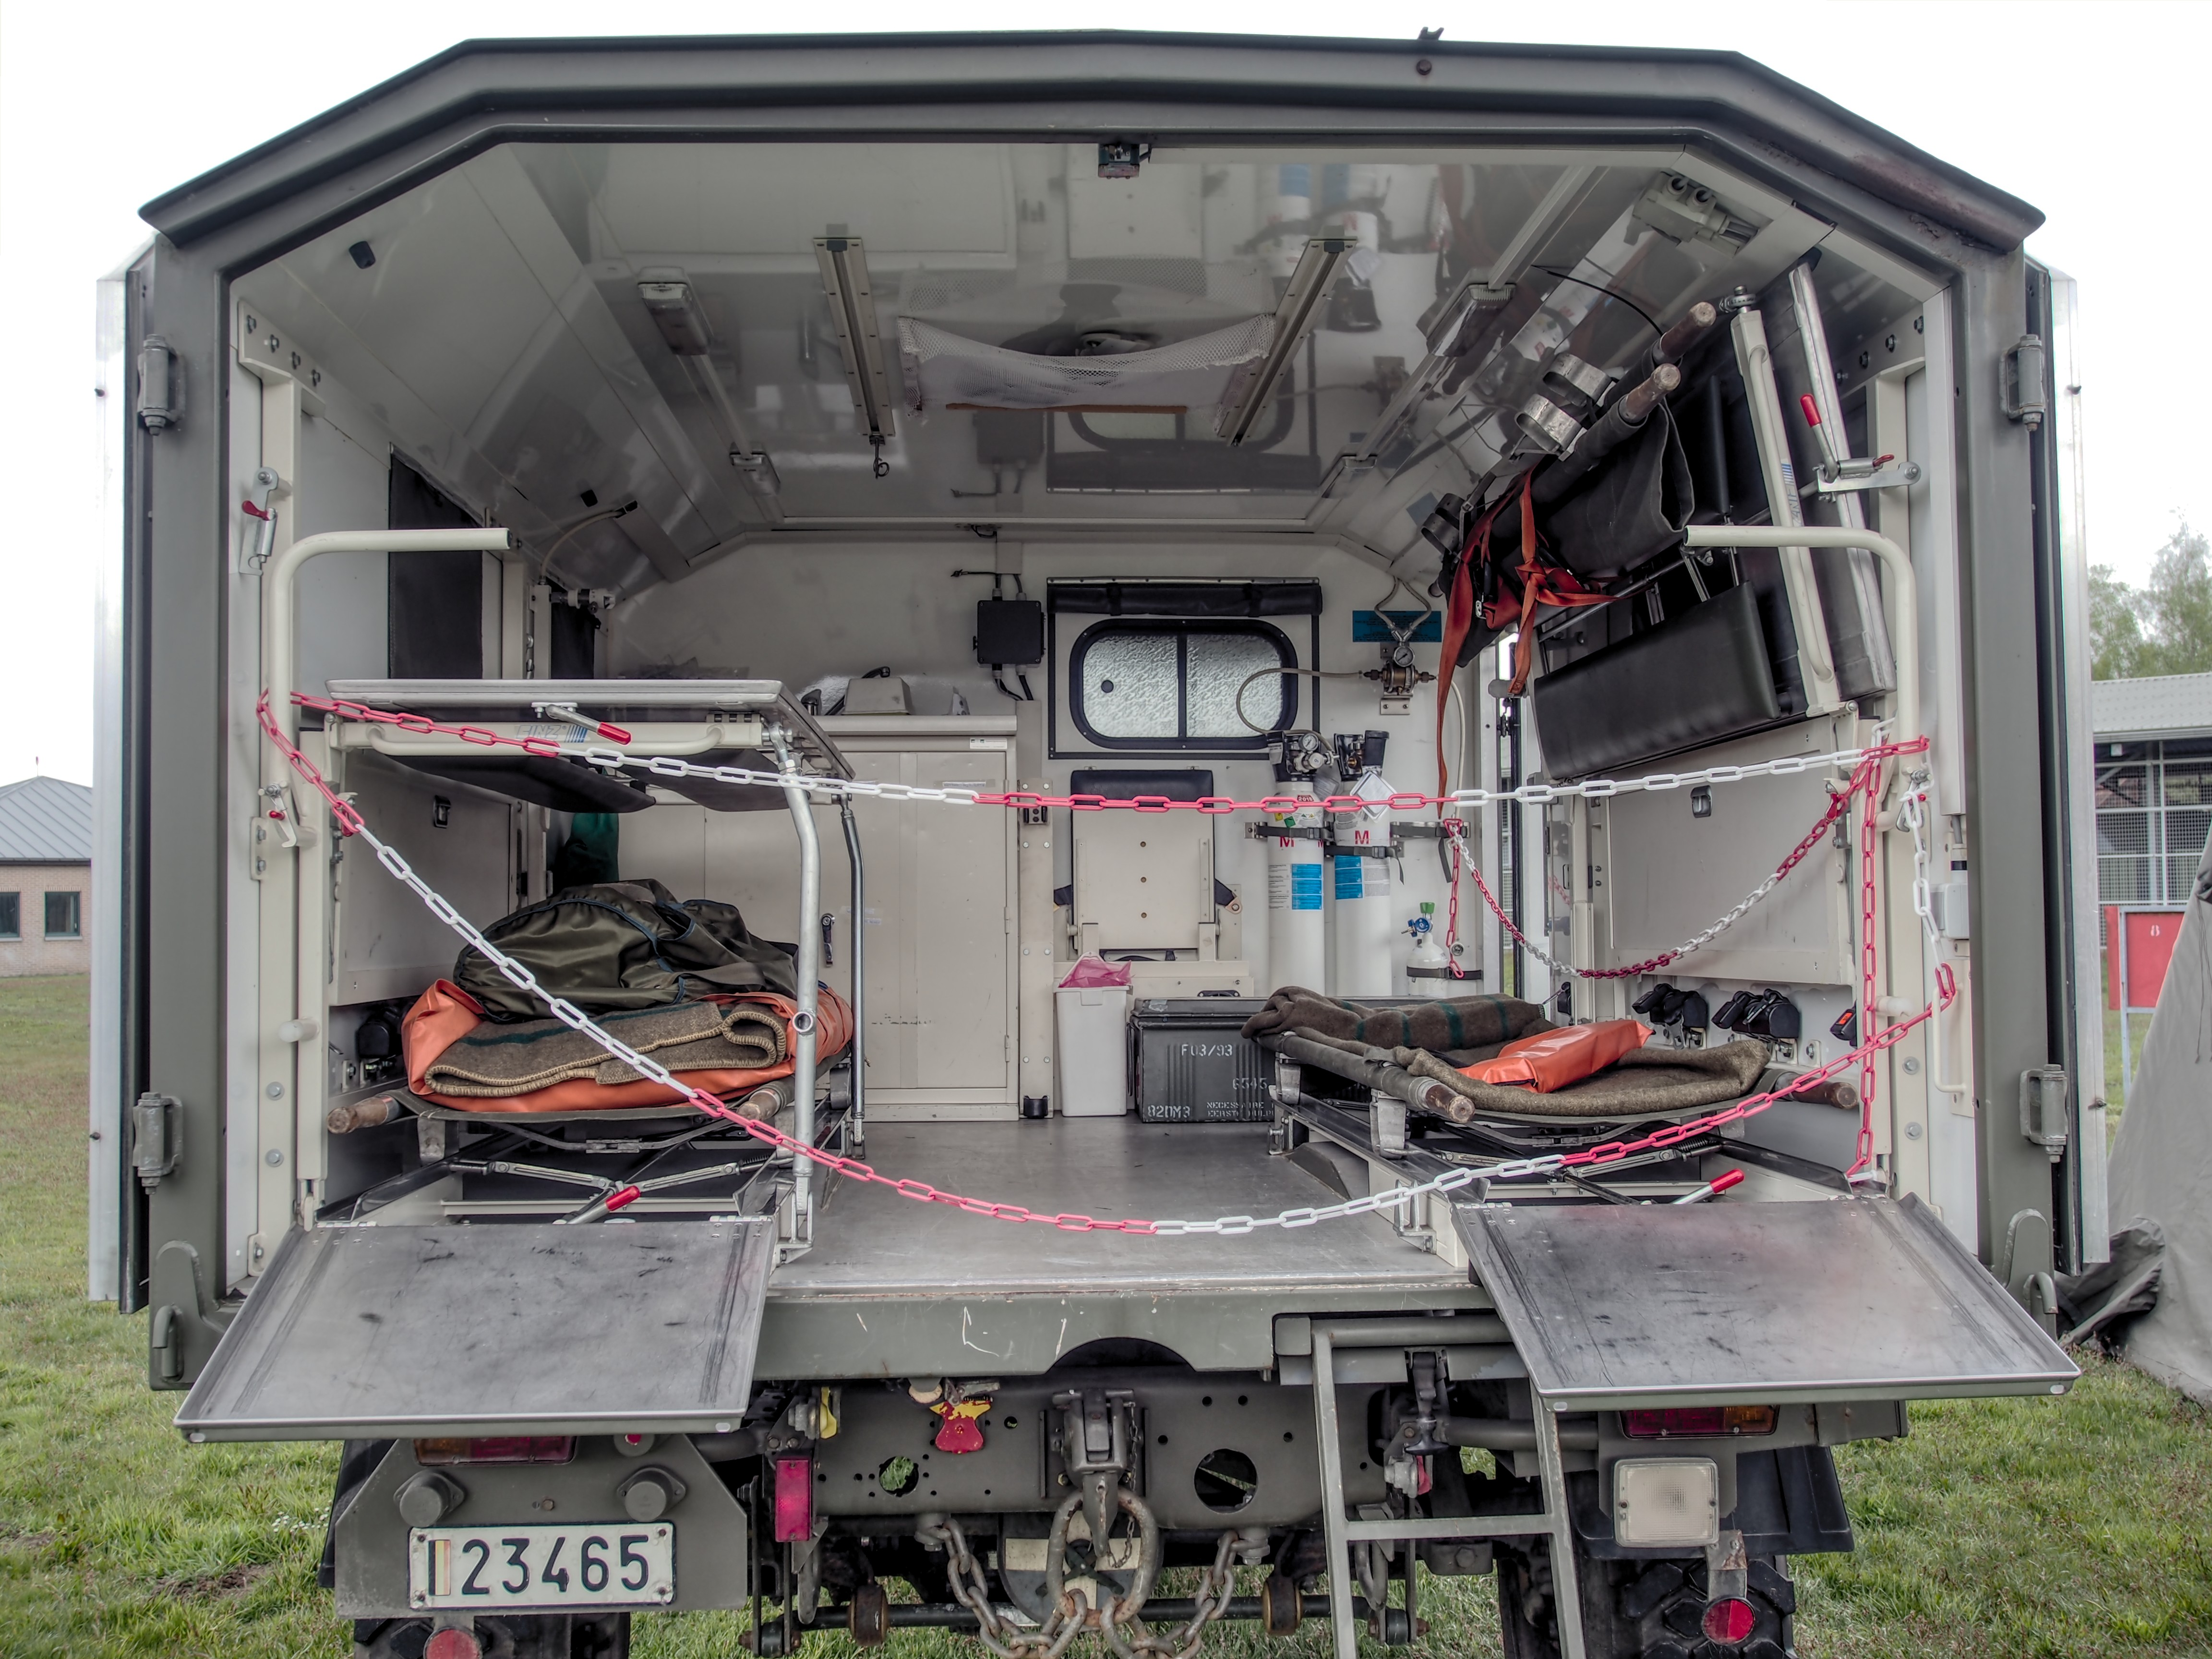 Mercedes Ambulance Wiring Experience Of Diagram Leader Diagrams File Unimog Military At Erfgoeddag 2017 Gunfire Rh Commons Wikimedia Org Interior